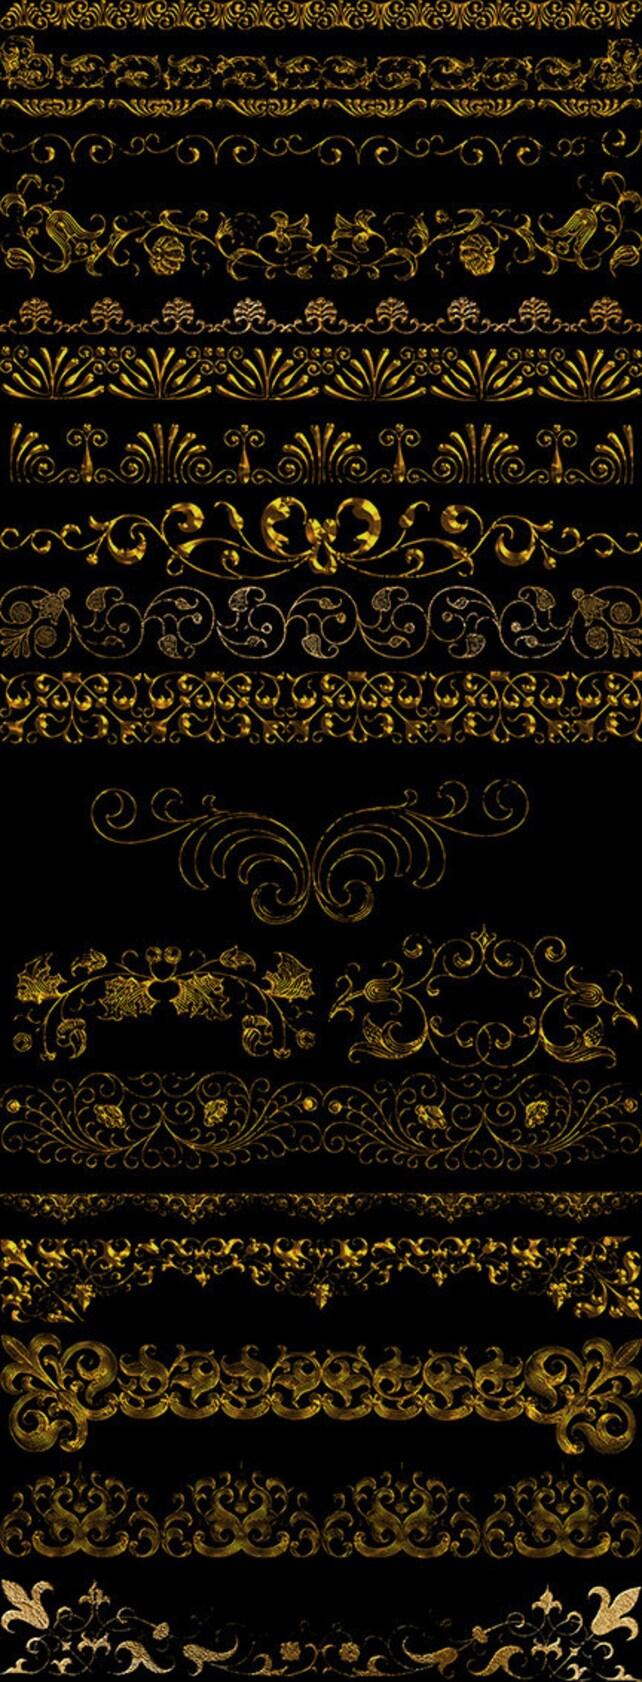 Altgold Grenzen Clipart Vintage Barock ornamentalen Rahmen | Etsy